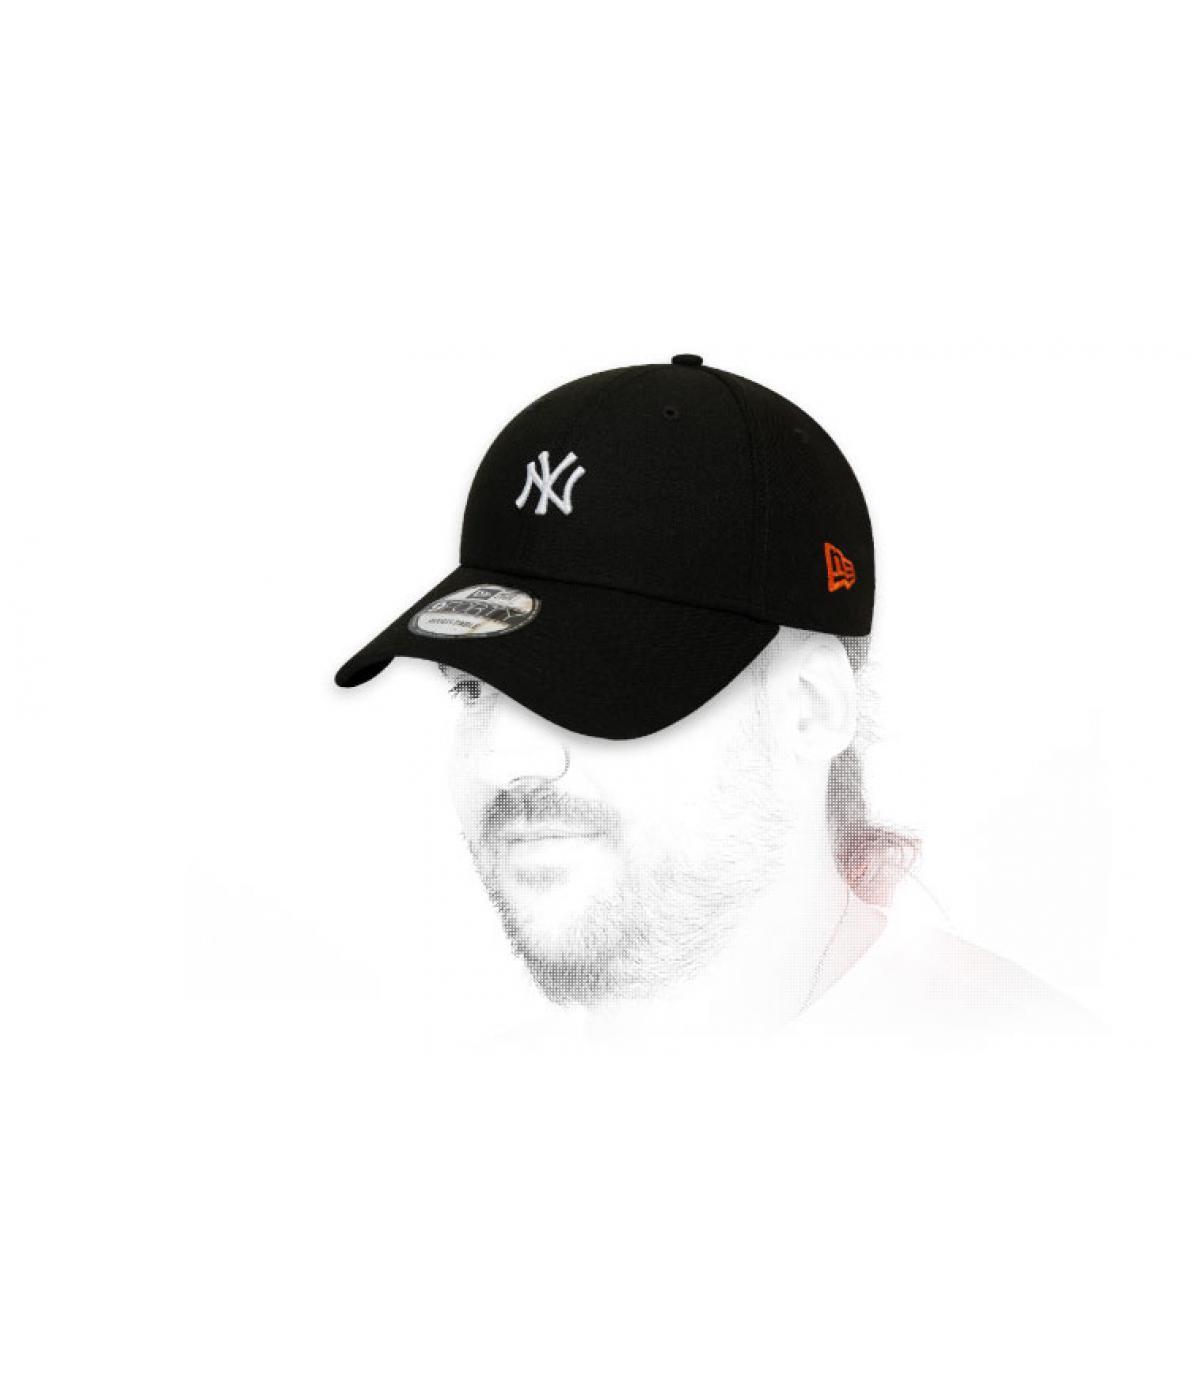 cappellino NY nero Giappone